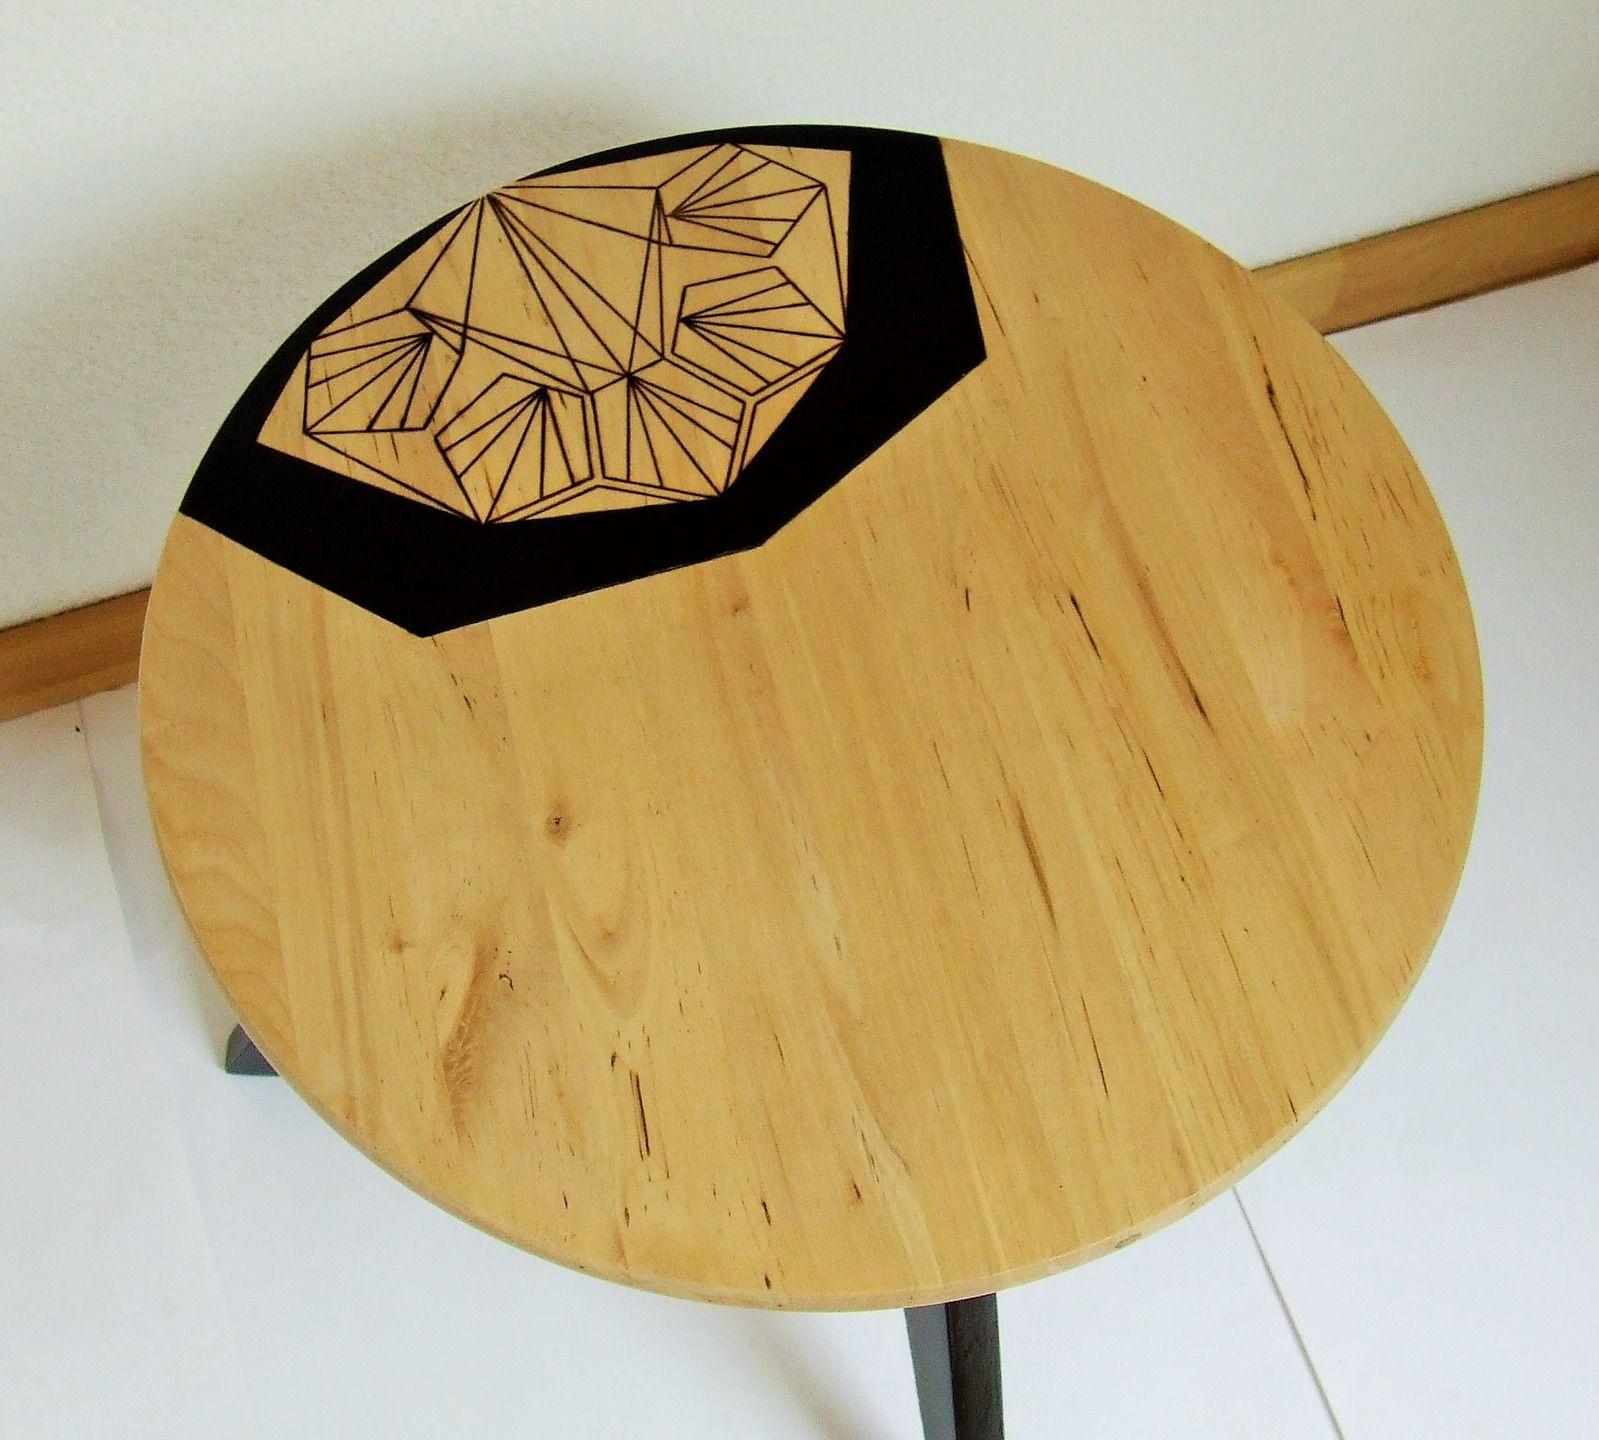 Table Basse Ronde En Bois Style Scandinave Motif